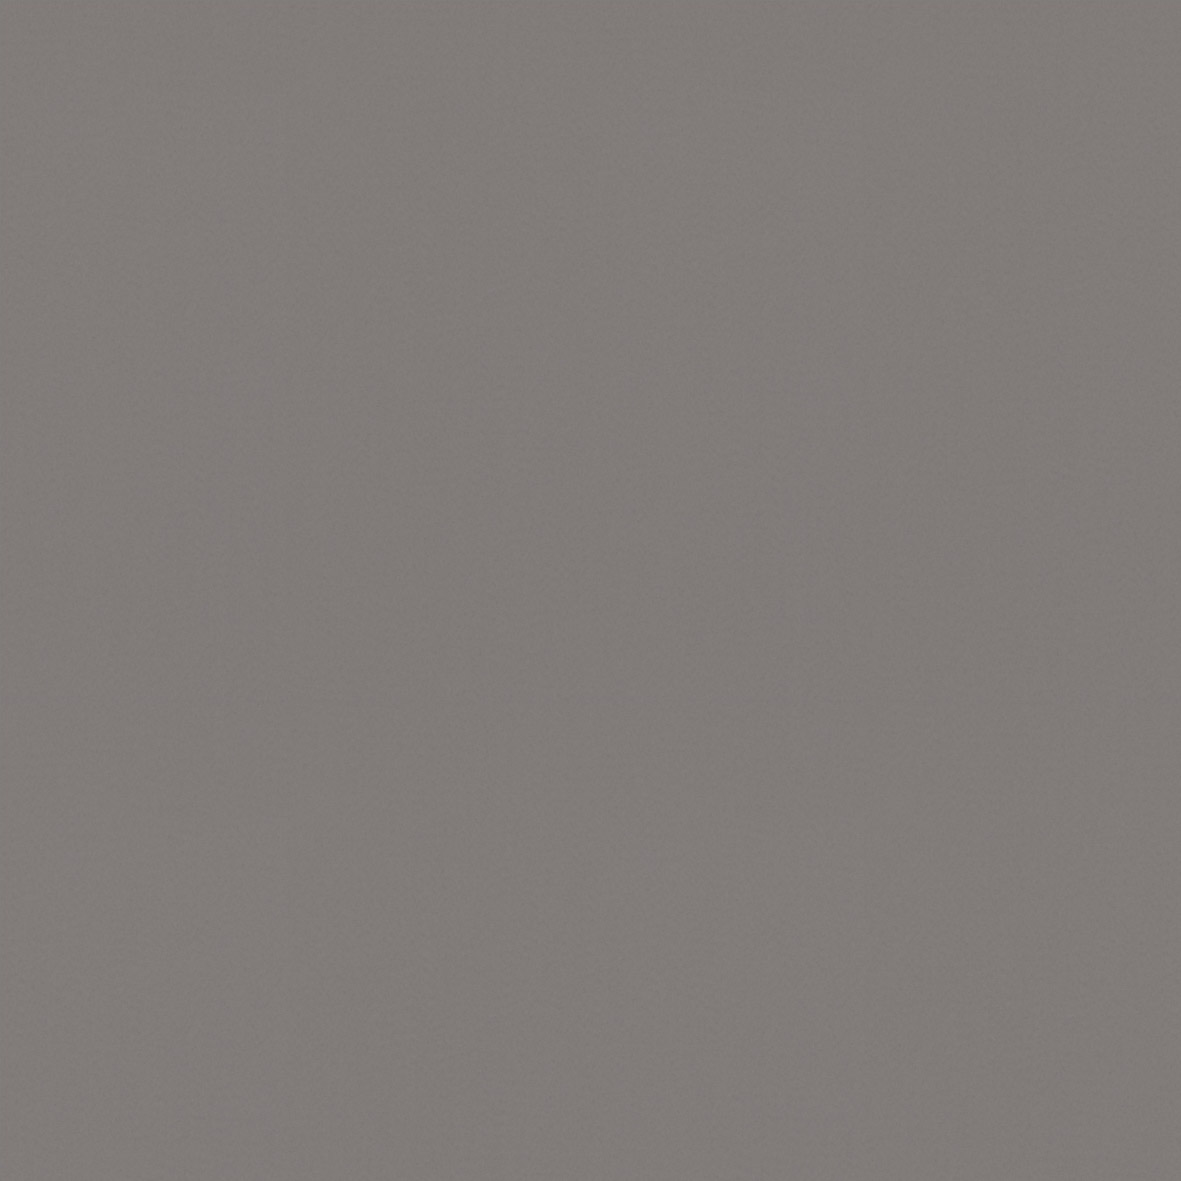 Roller_Swatch_Palette_Concrete_RE0023